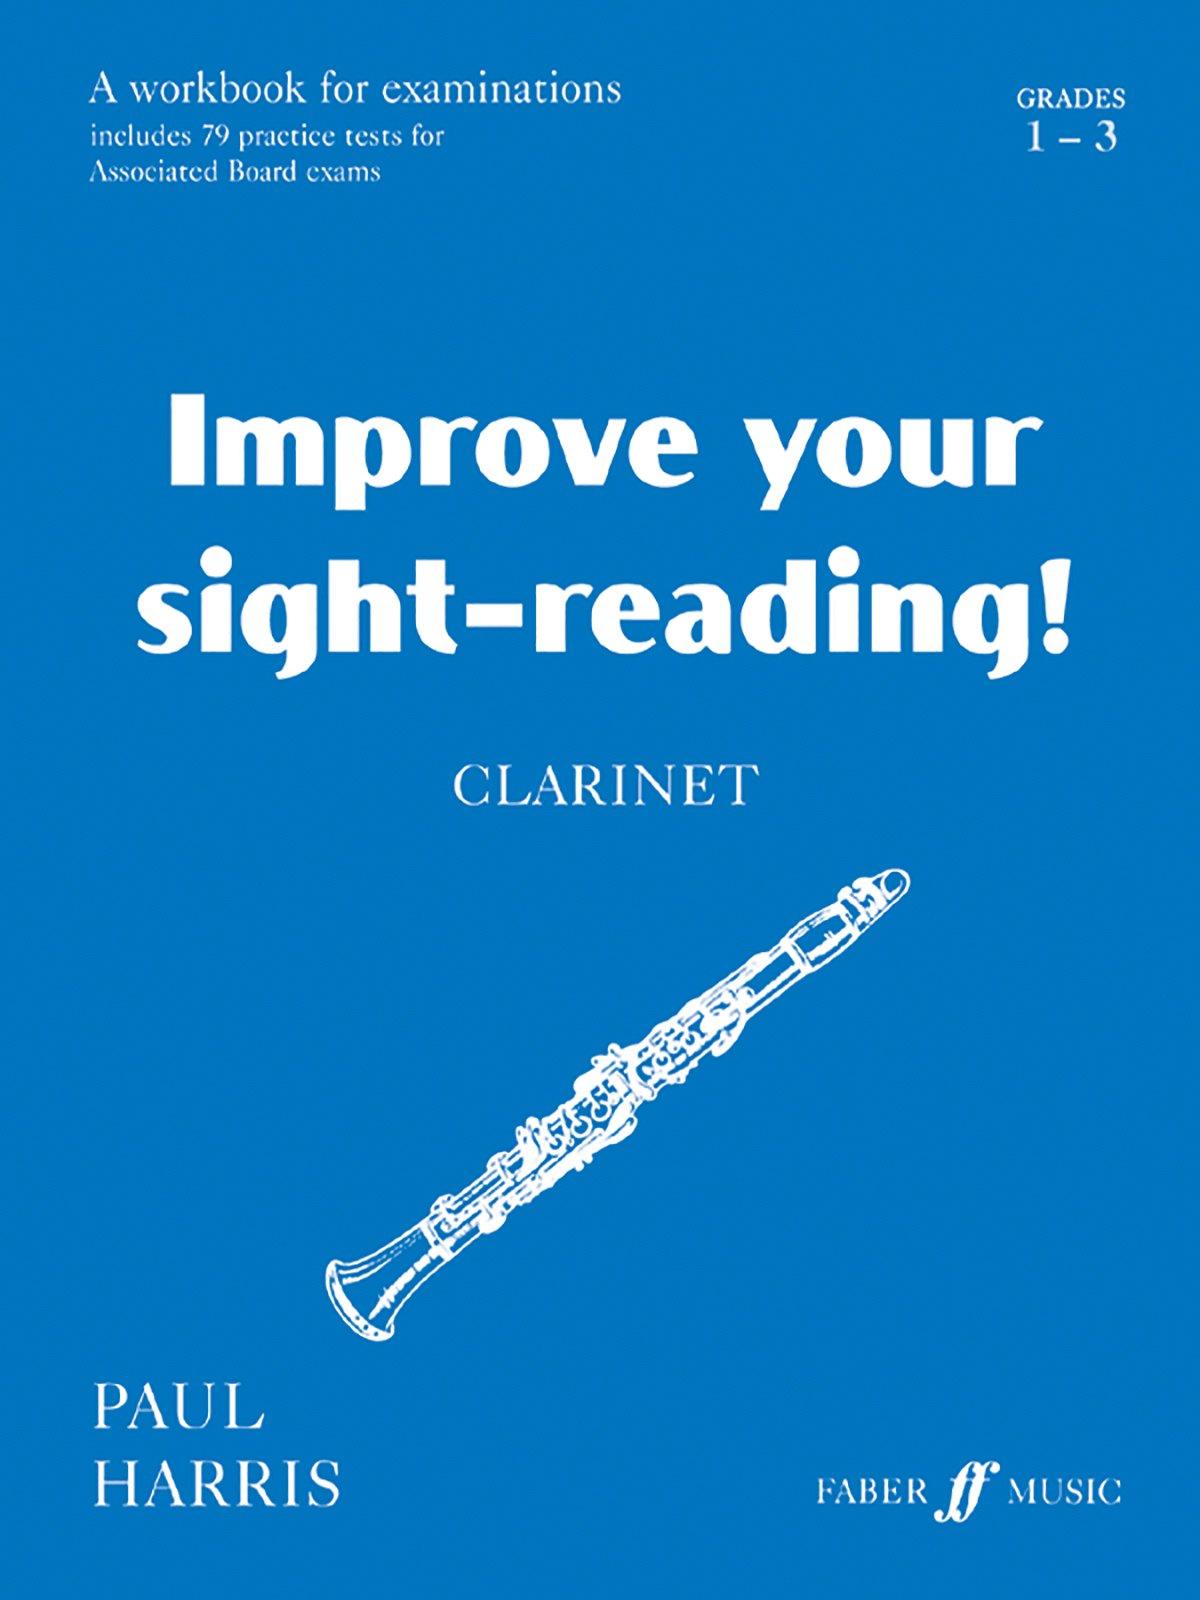 improve your sight reading clarinet grade amazon co uk paul improve your sight reading clarinet grade 1 3 amazon co uk paul harris 9780571514649 books